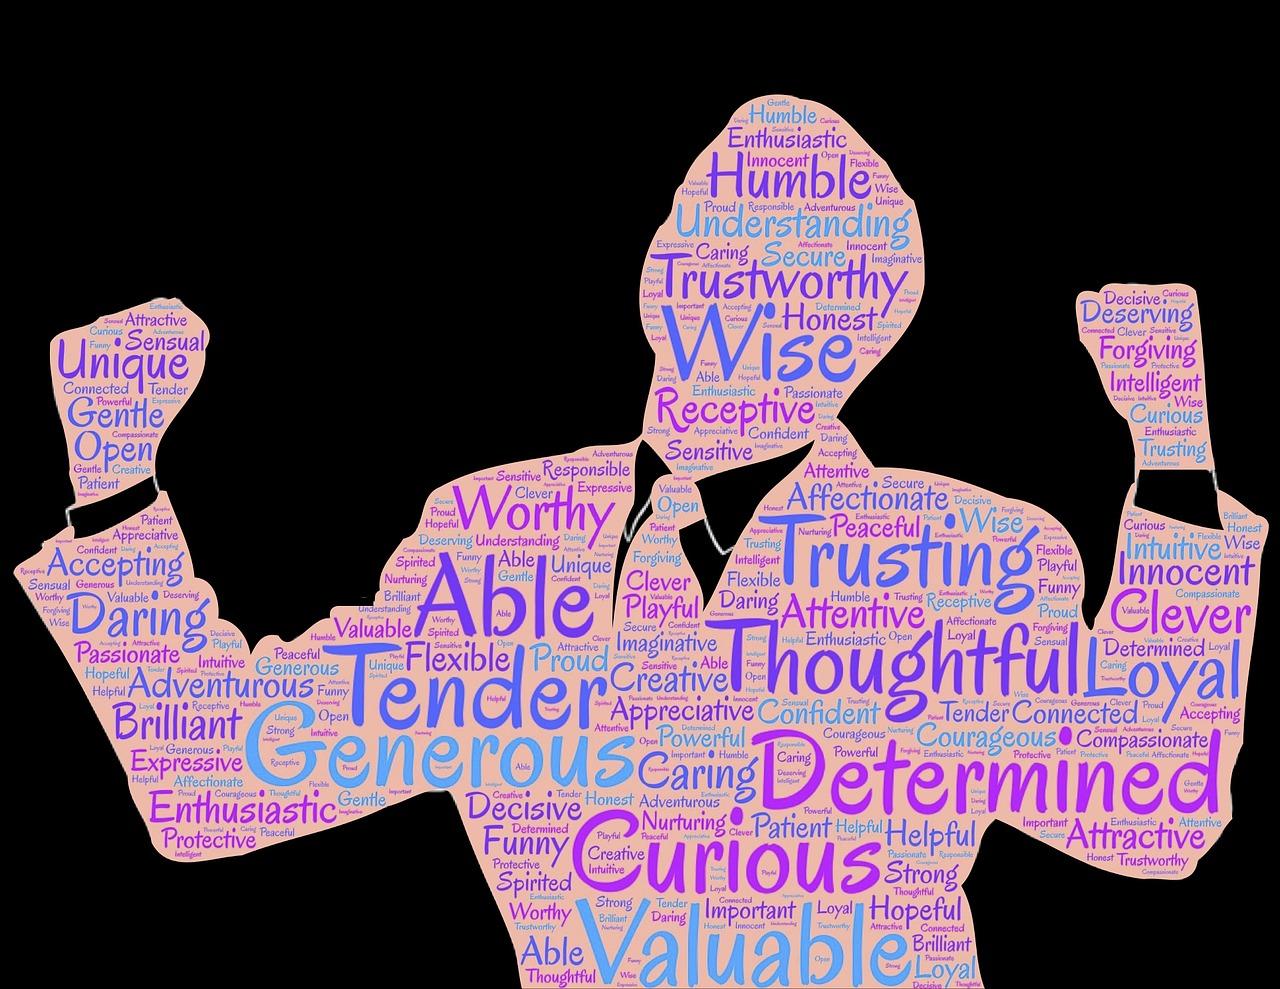 Qualities Man Self-Confidence - Free image on Pixabay